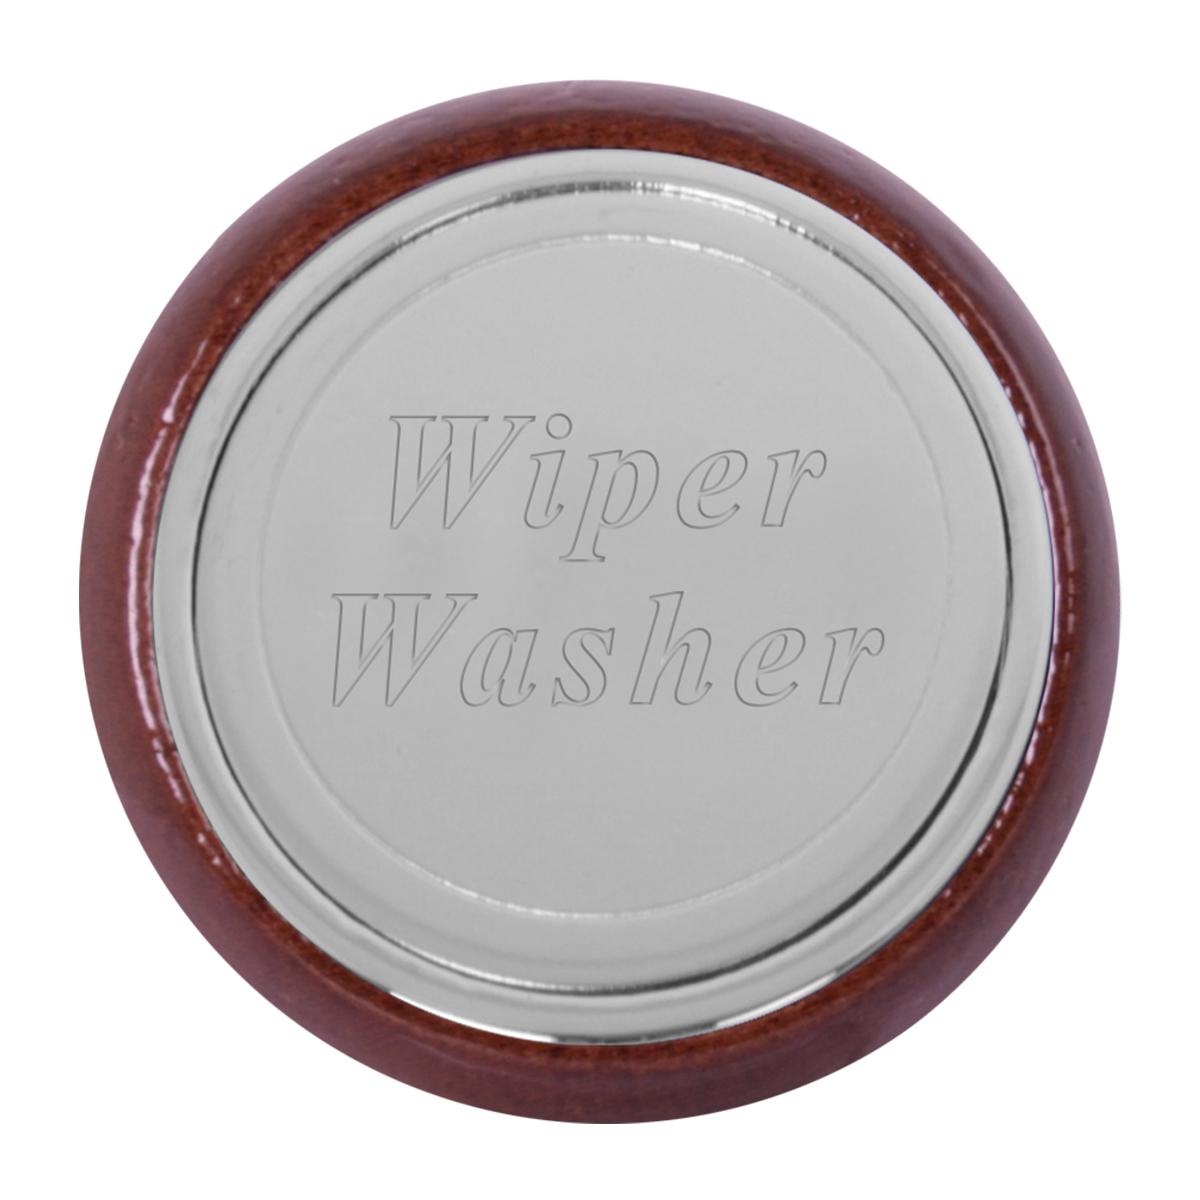 96032 Dashboard Control Knob w/ Wiper/Washer Script